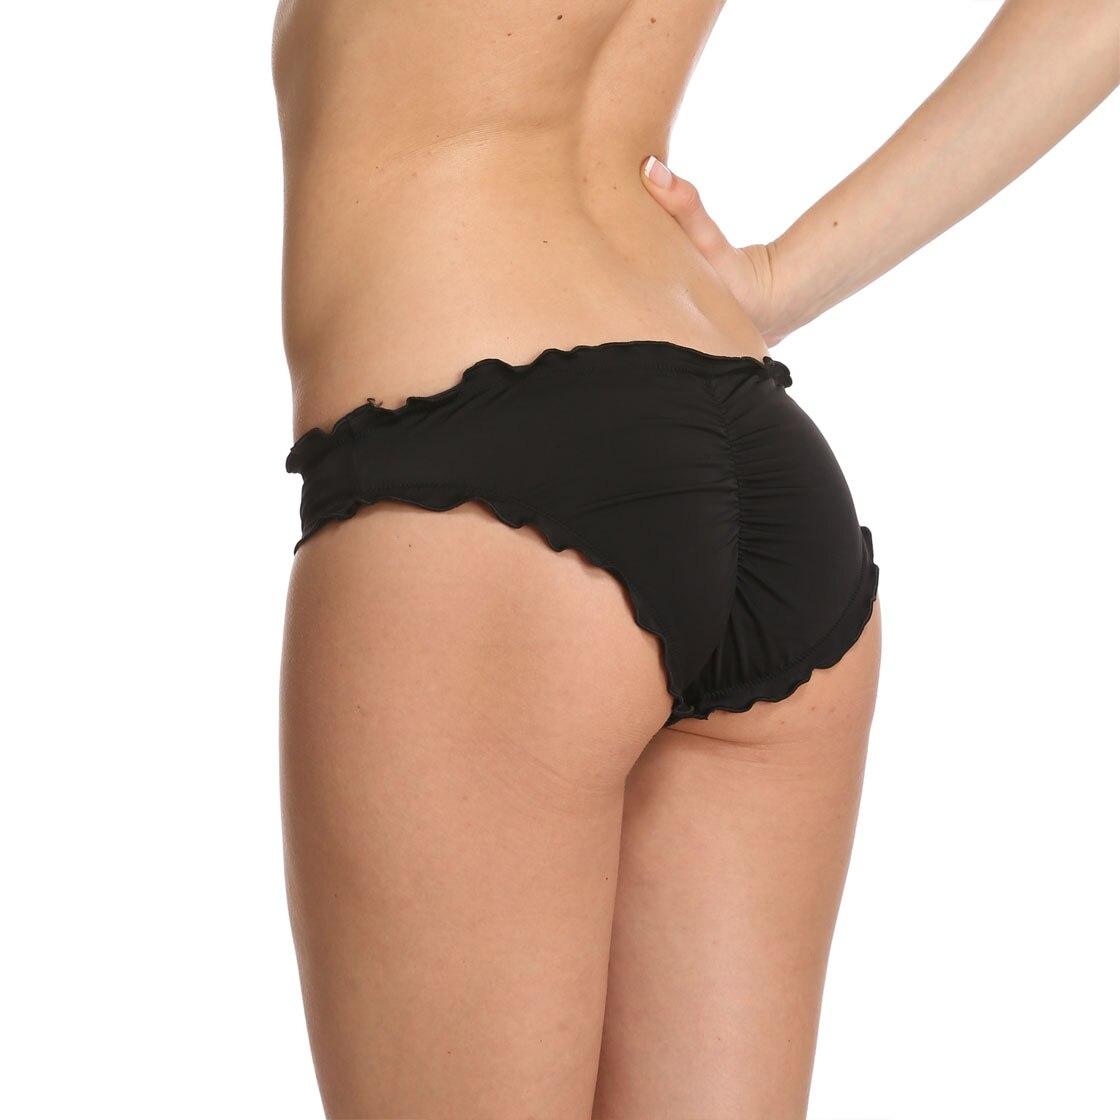 Sexy Women Bikini bottom Lace Elastic High Waist Cheeky Black  Brazilian Bikini Low Waist Bottoms Mini Plus Size  Summer secret 1